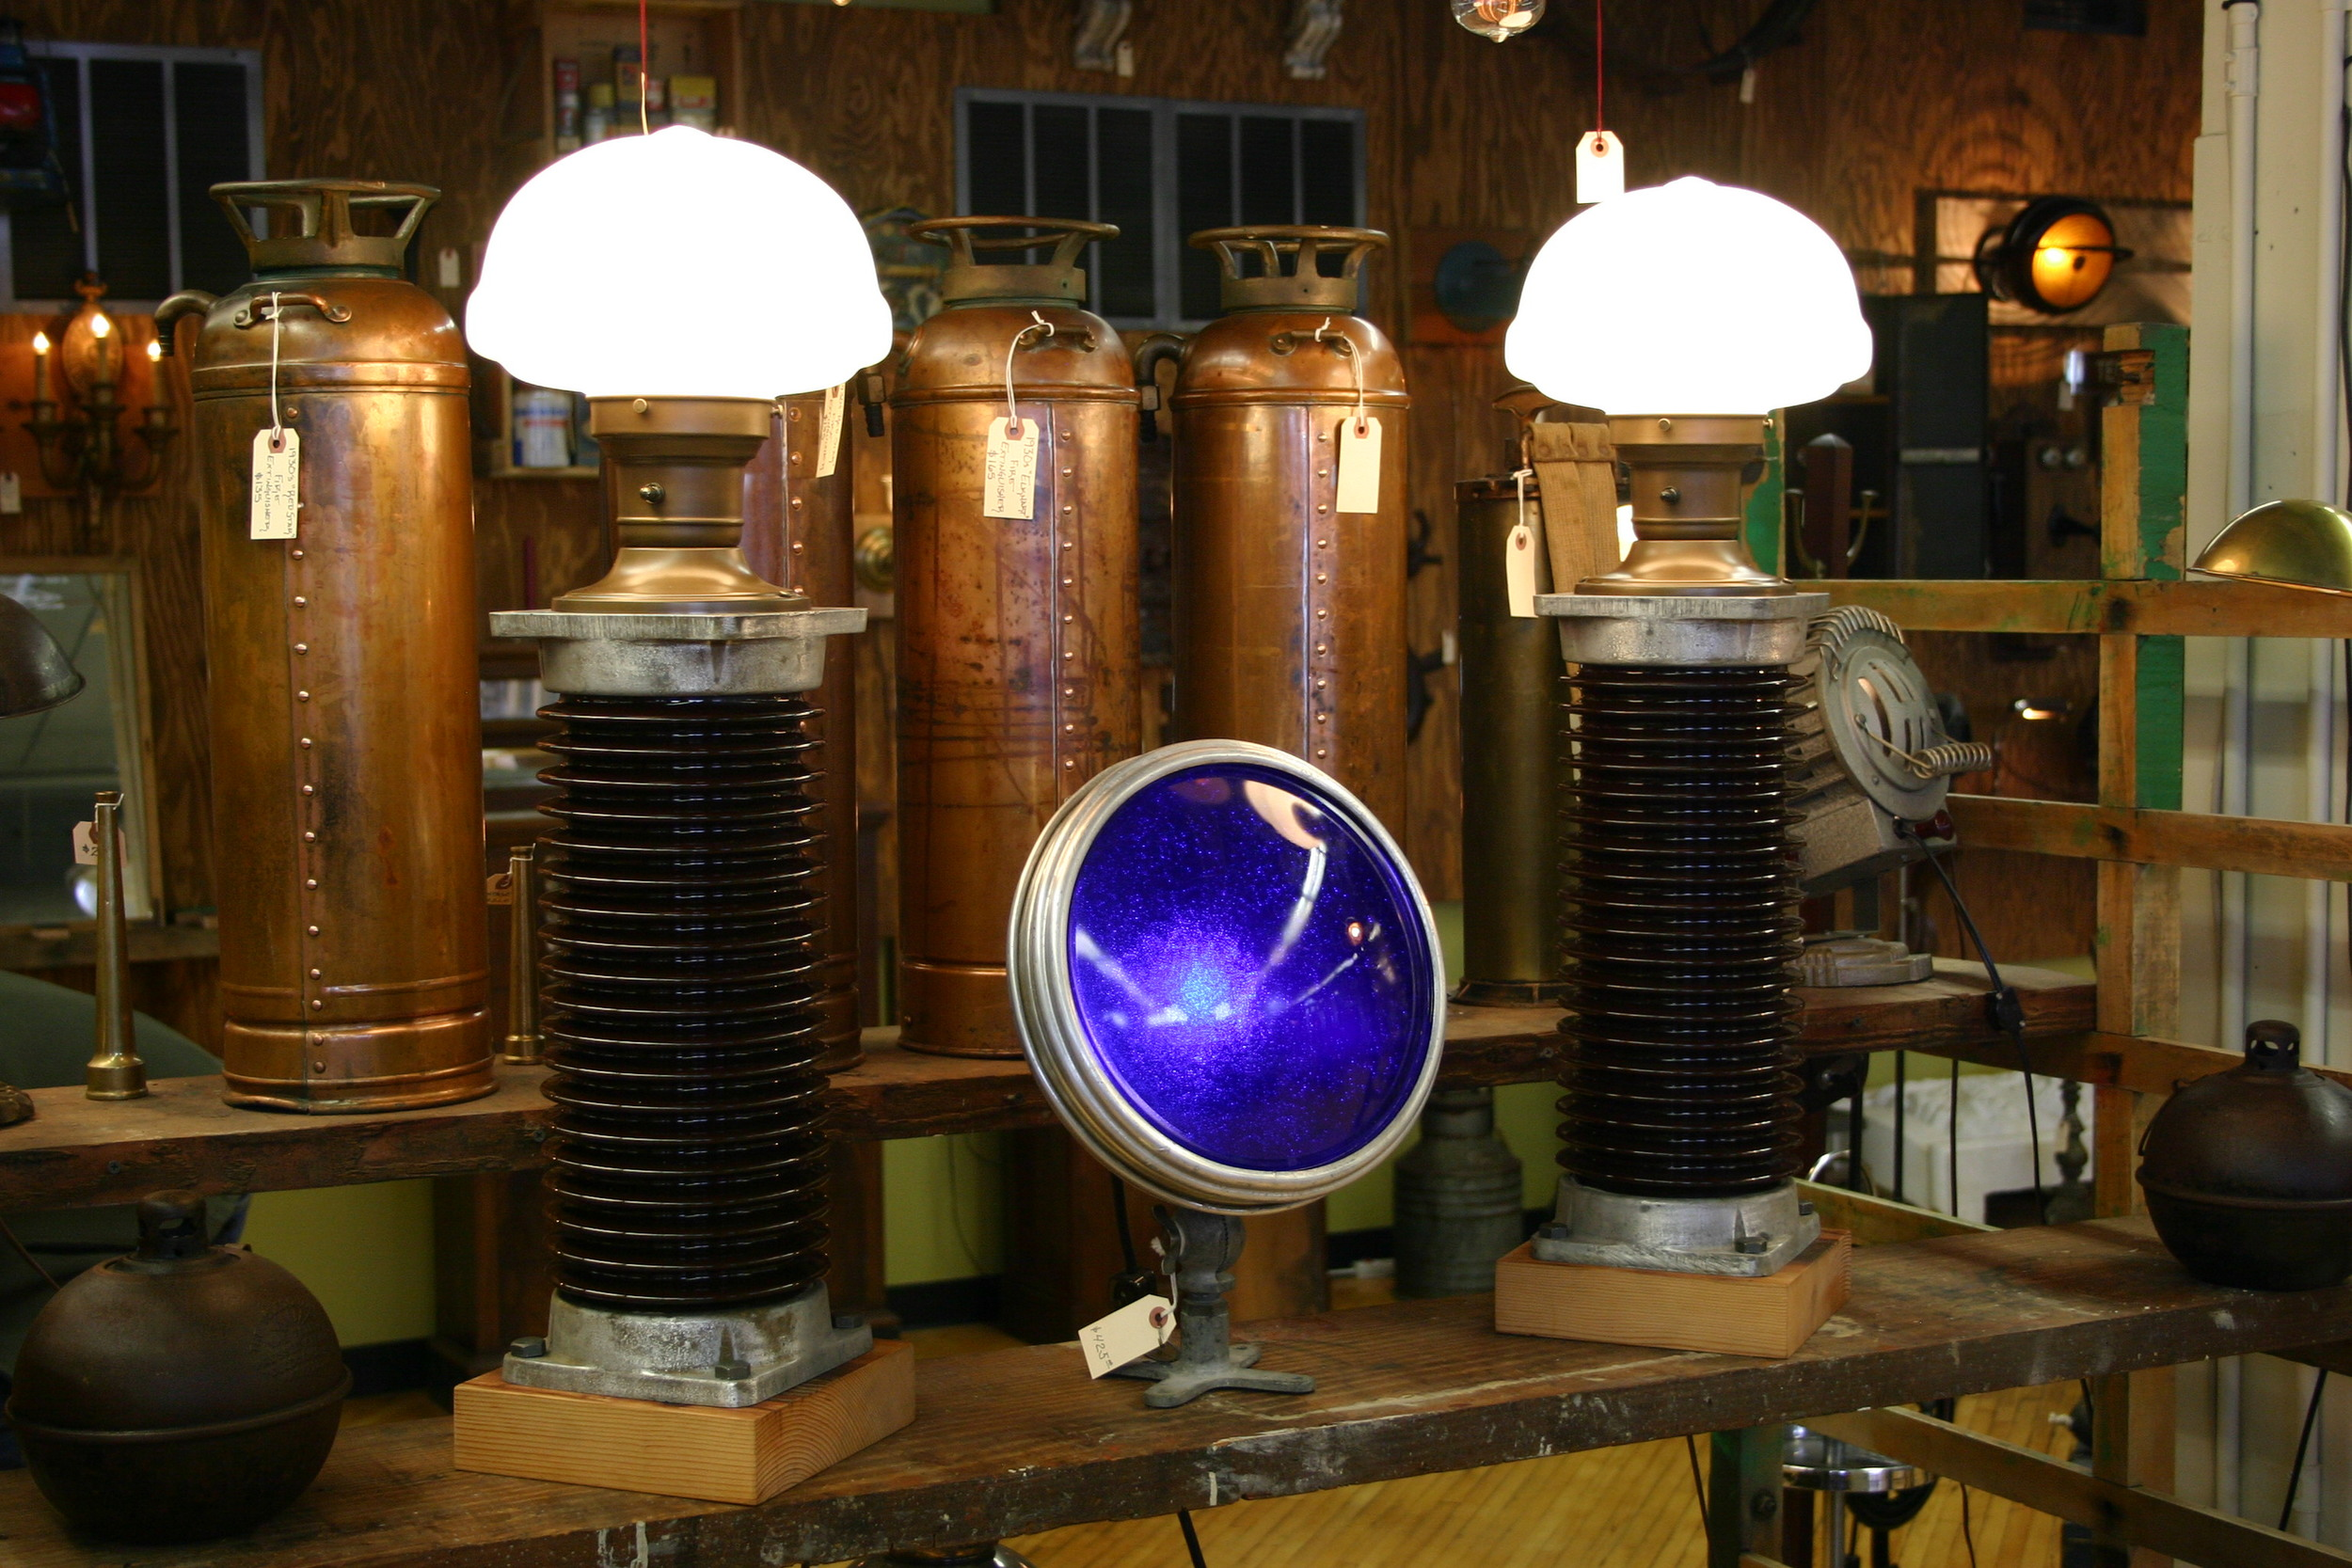 Tesla Electrical Insulator Lamps